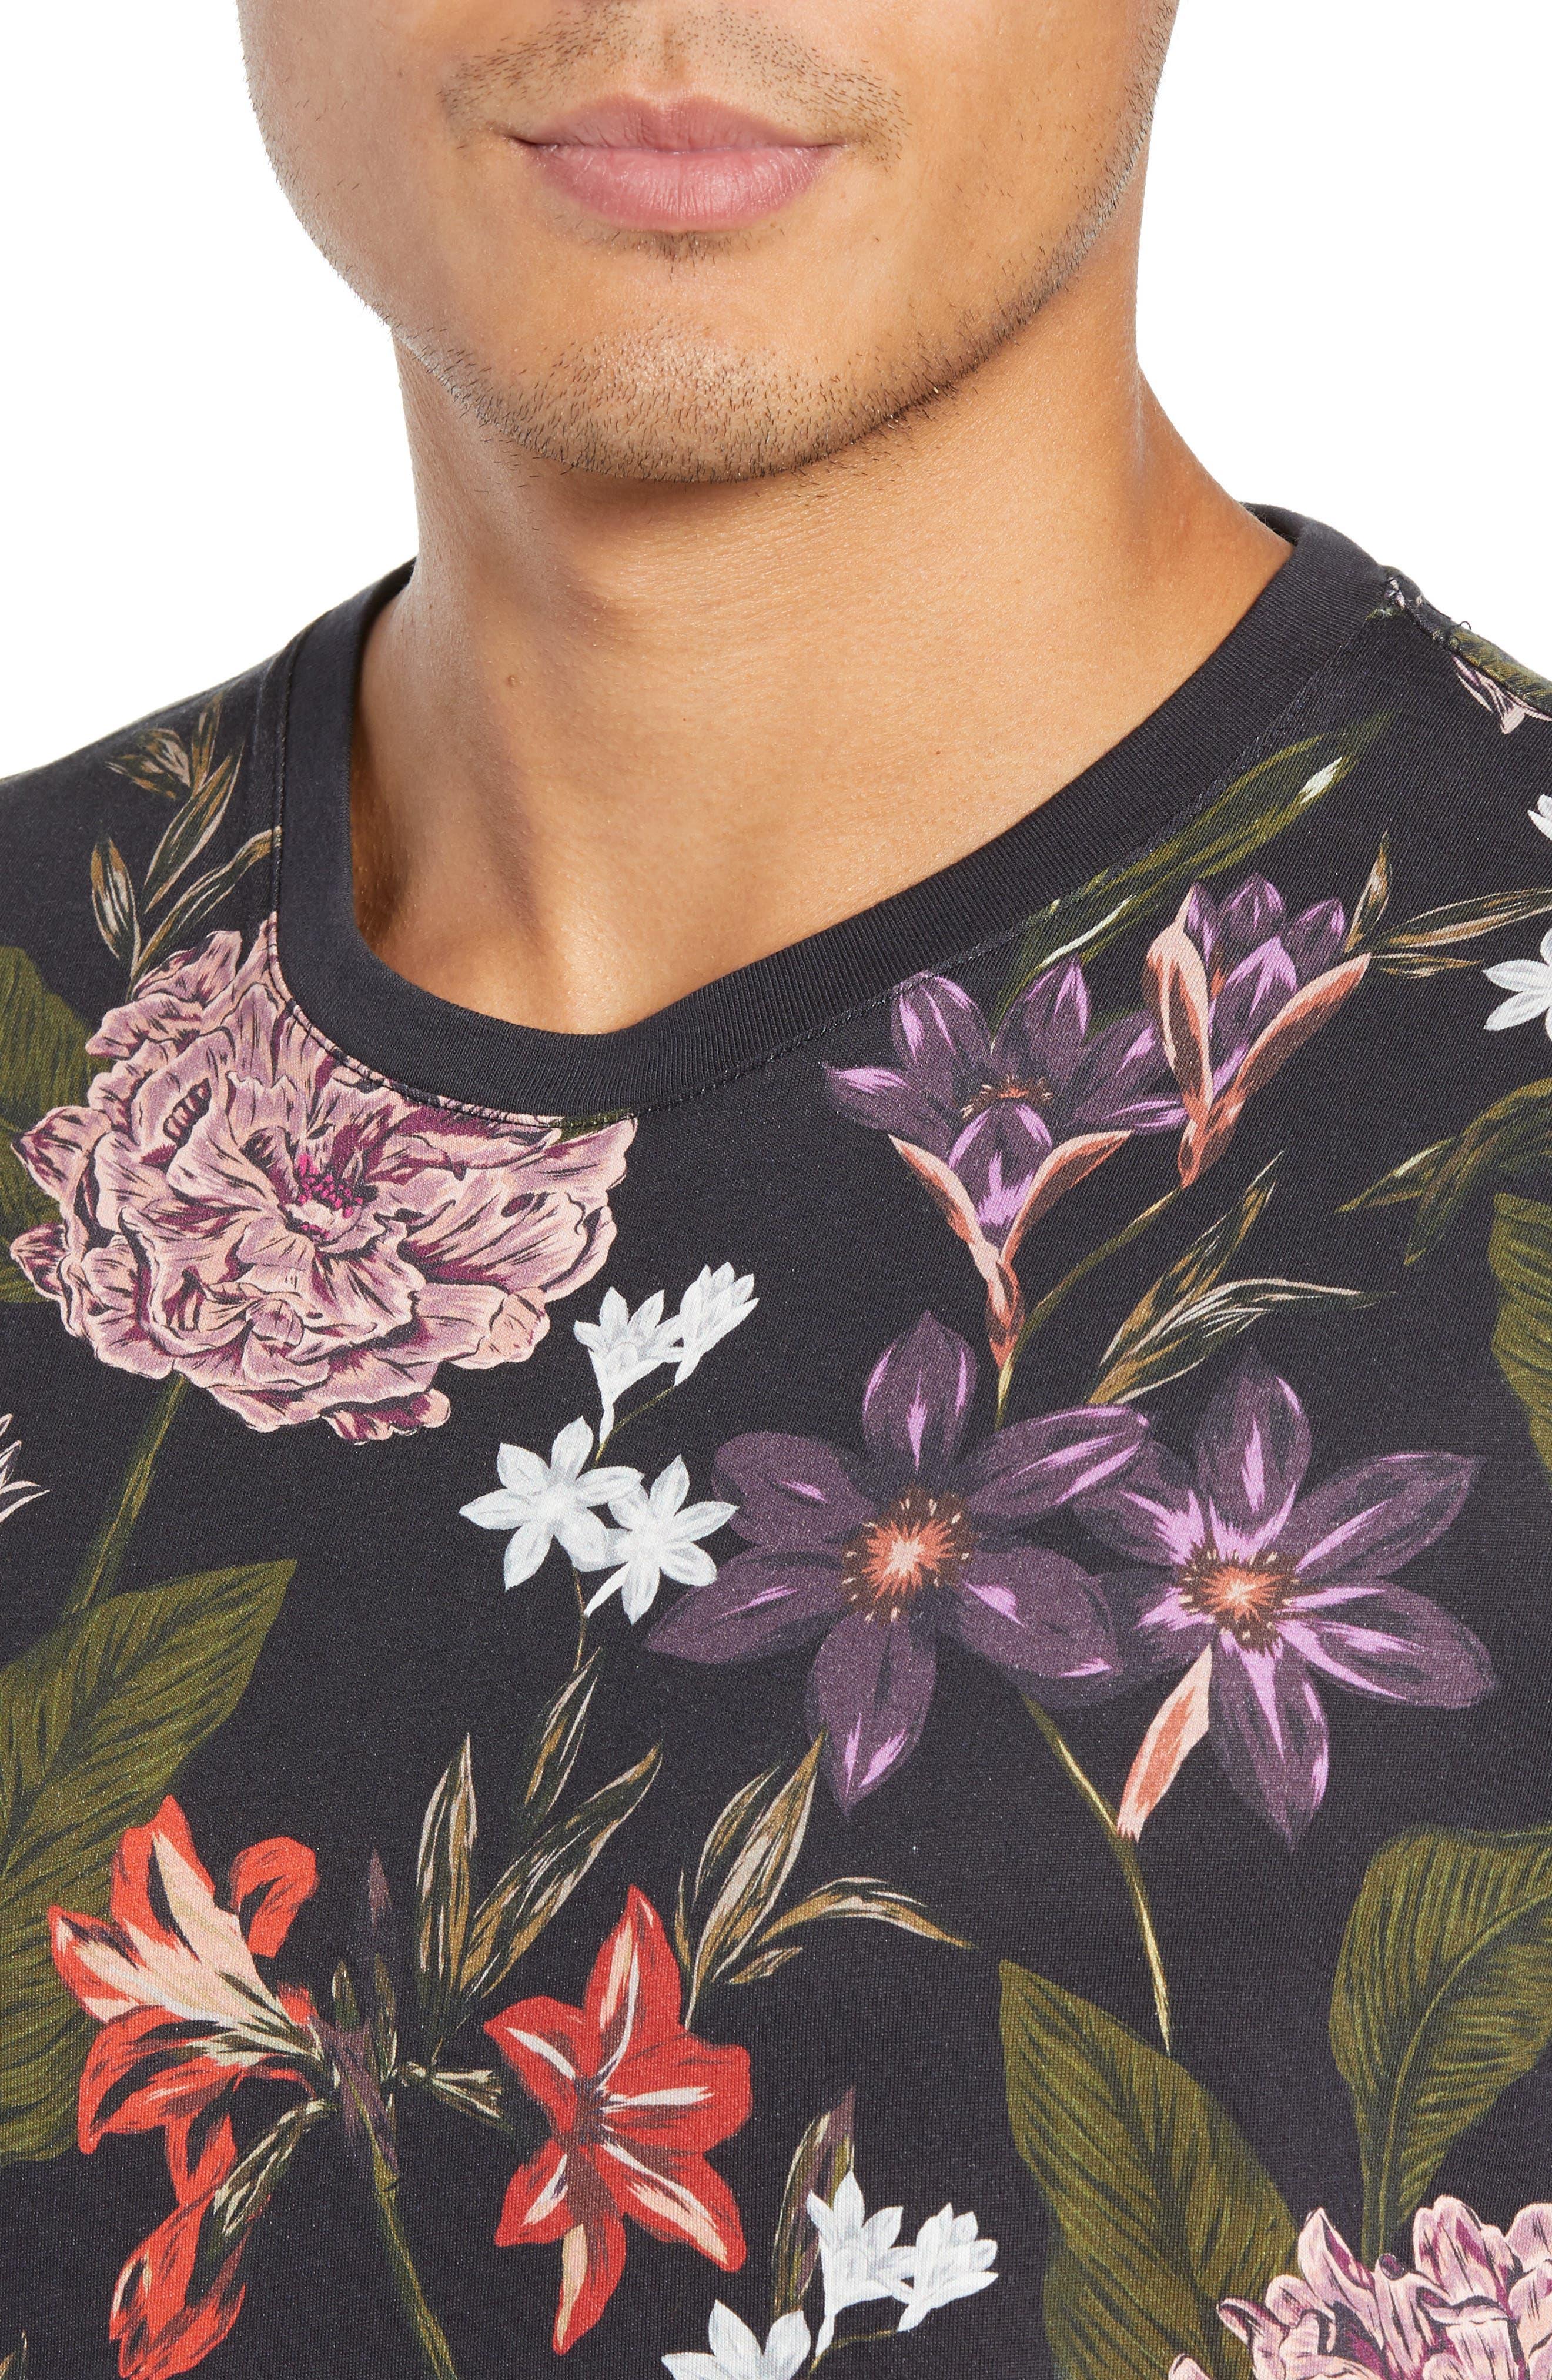 Glee Slim Fit Print T-Shirt,                             Alternate thumbnail 4, color,                             NAVY